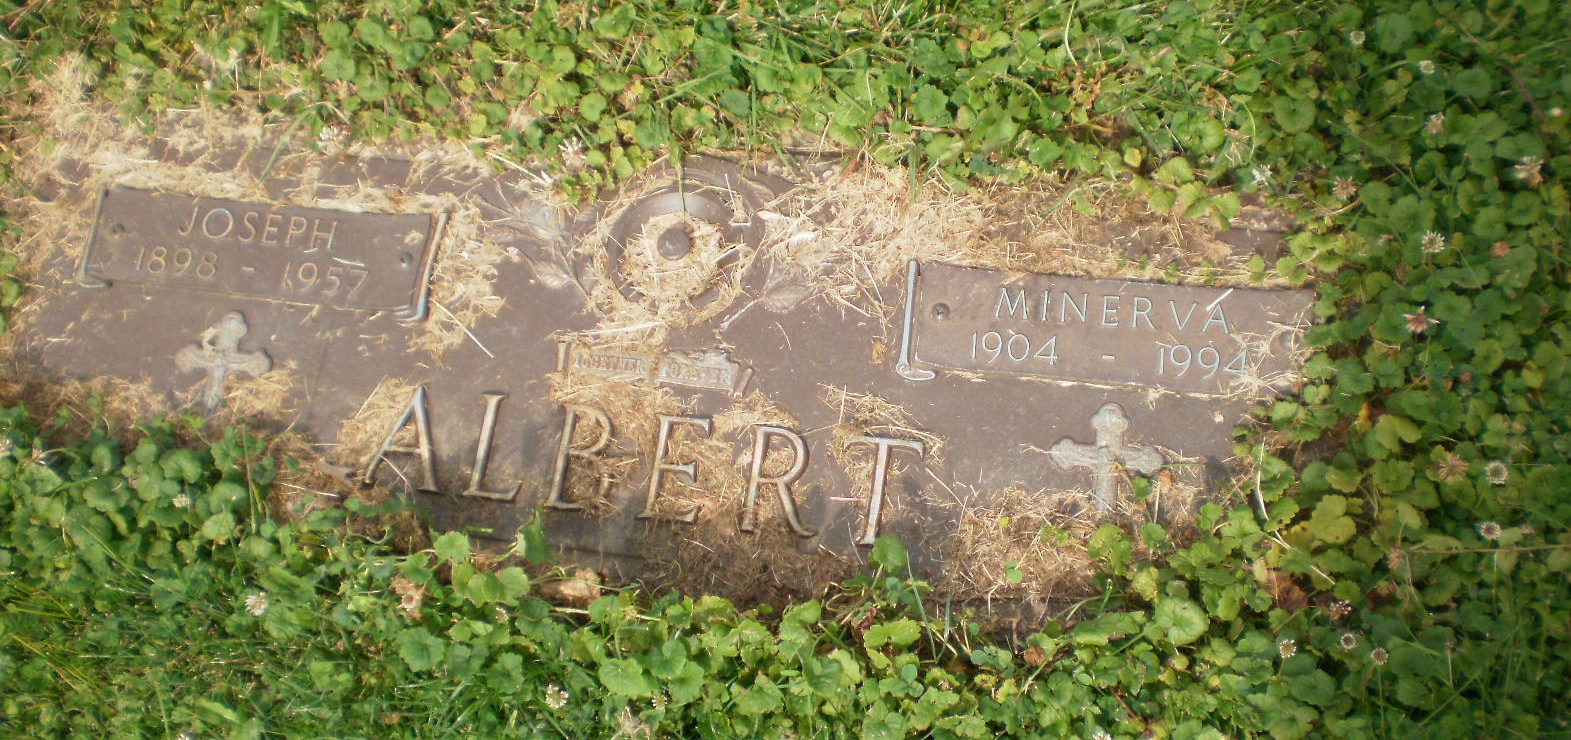 Joseph Albert